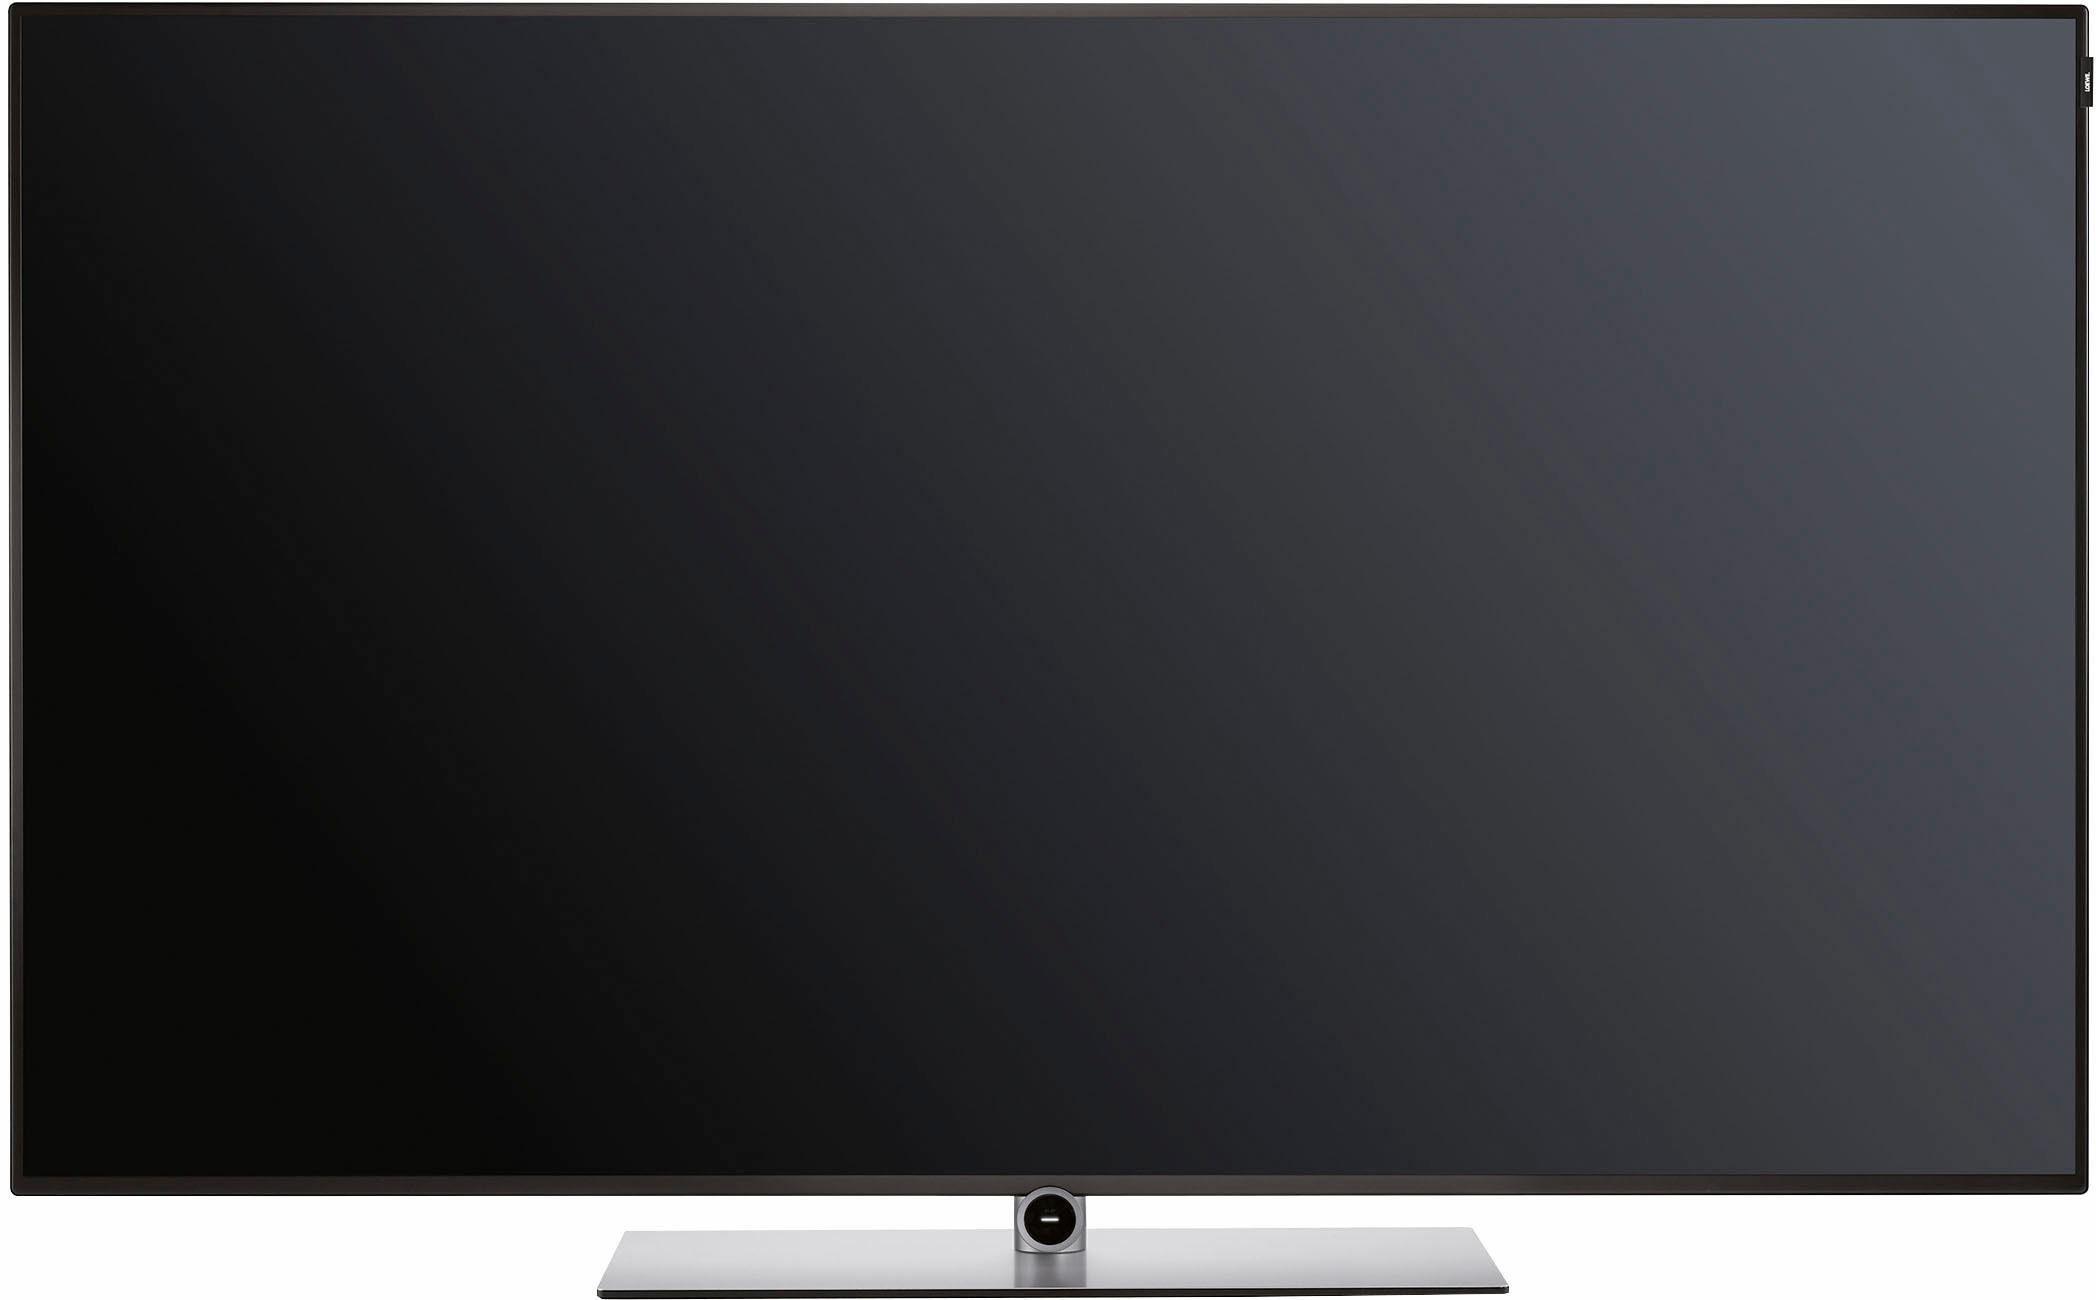 Loewe bild 1.65 LED-Fernseher (165 cm/65 Zoll, 4K Ultra HD, Smart-TV, Home Control Interface)